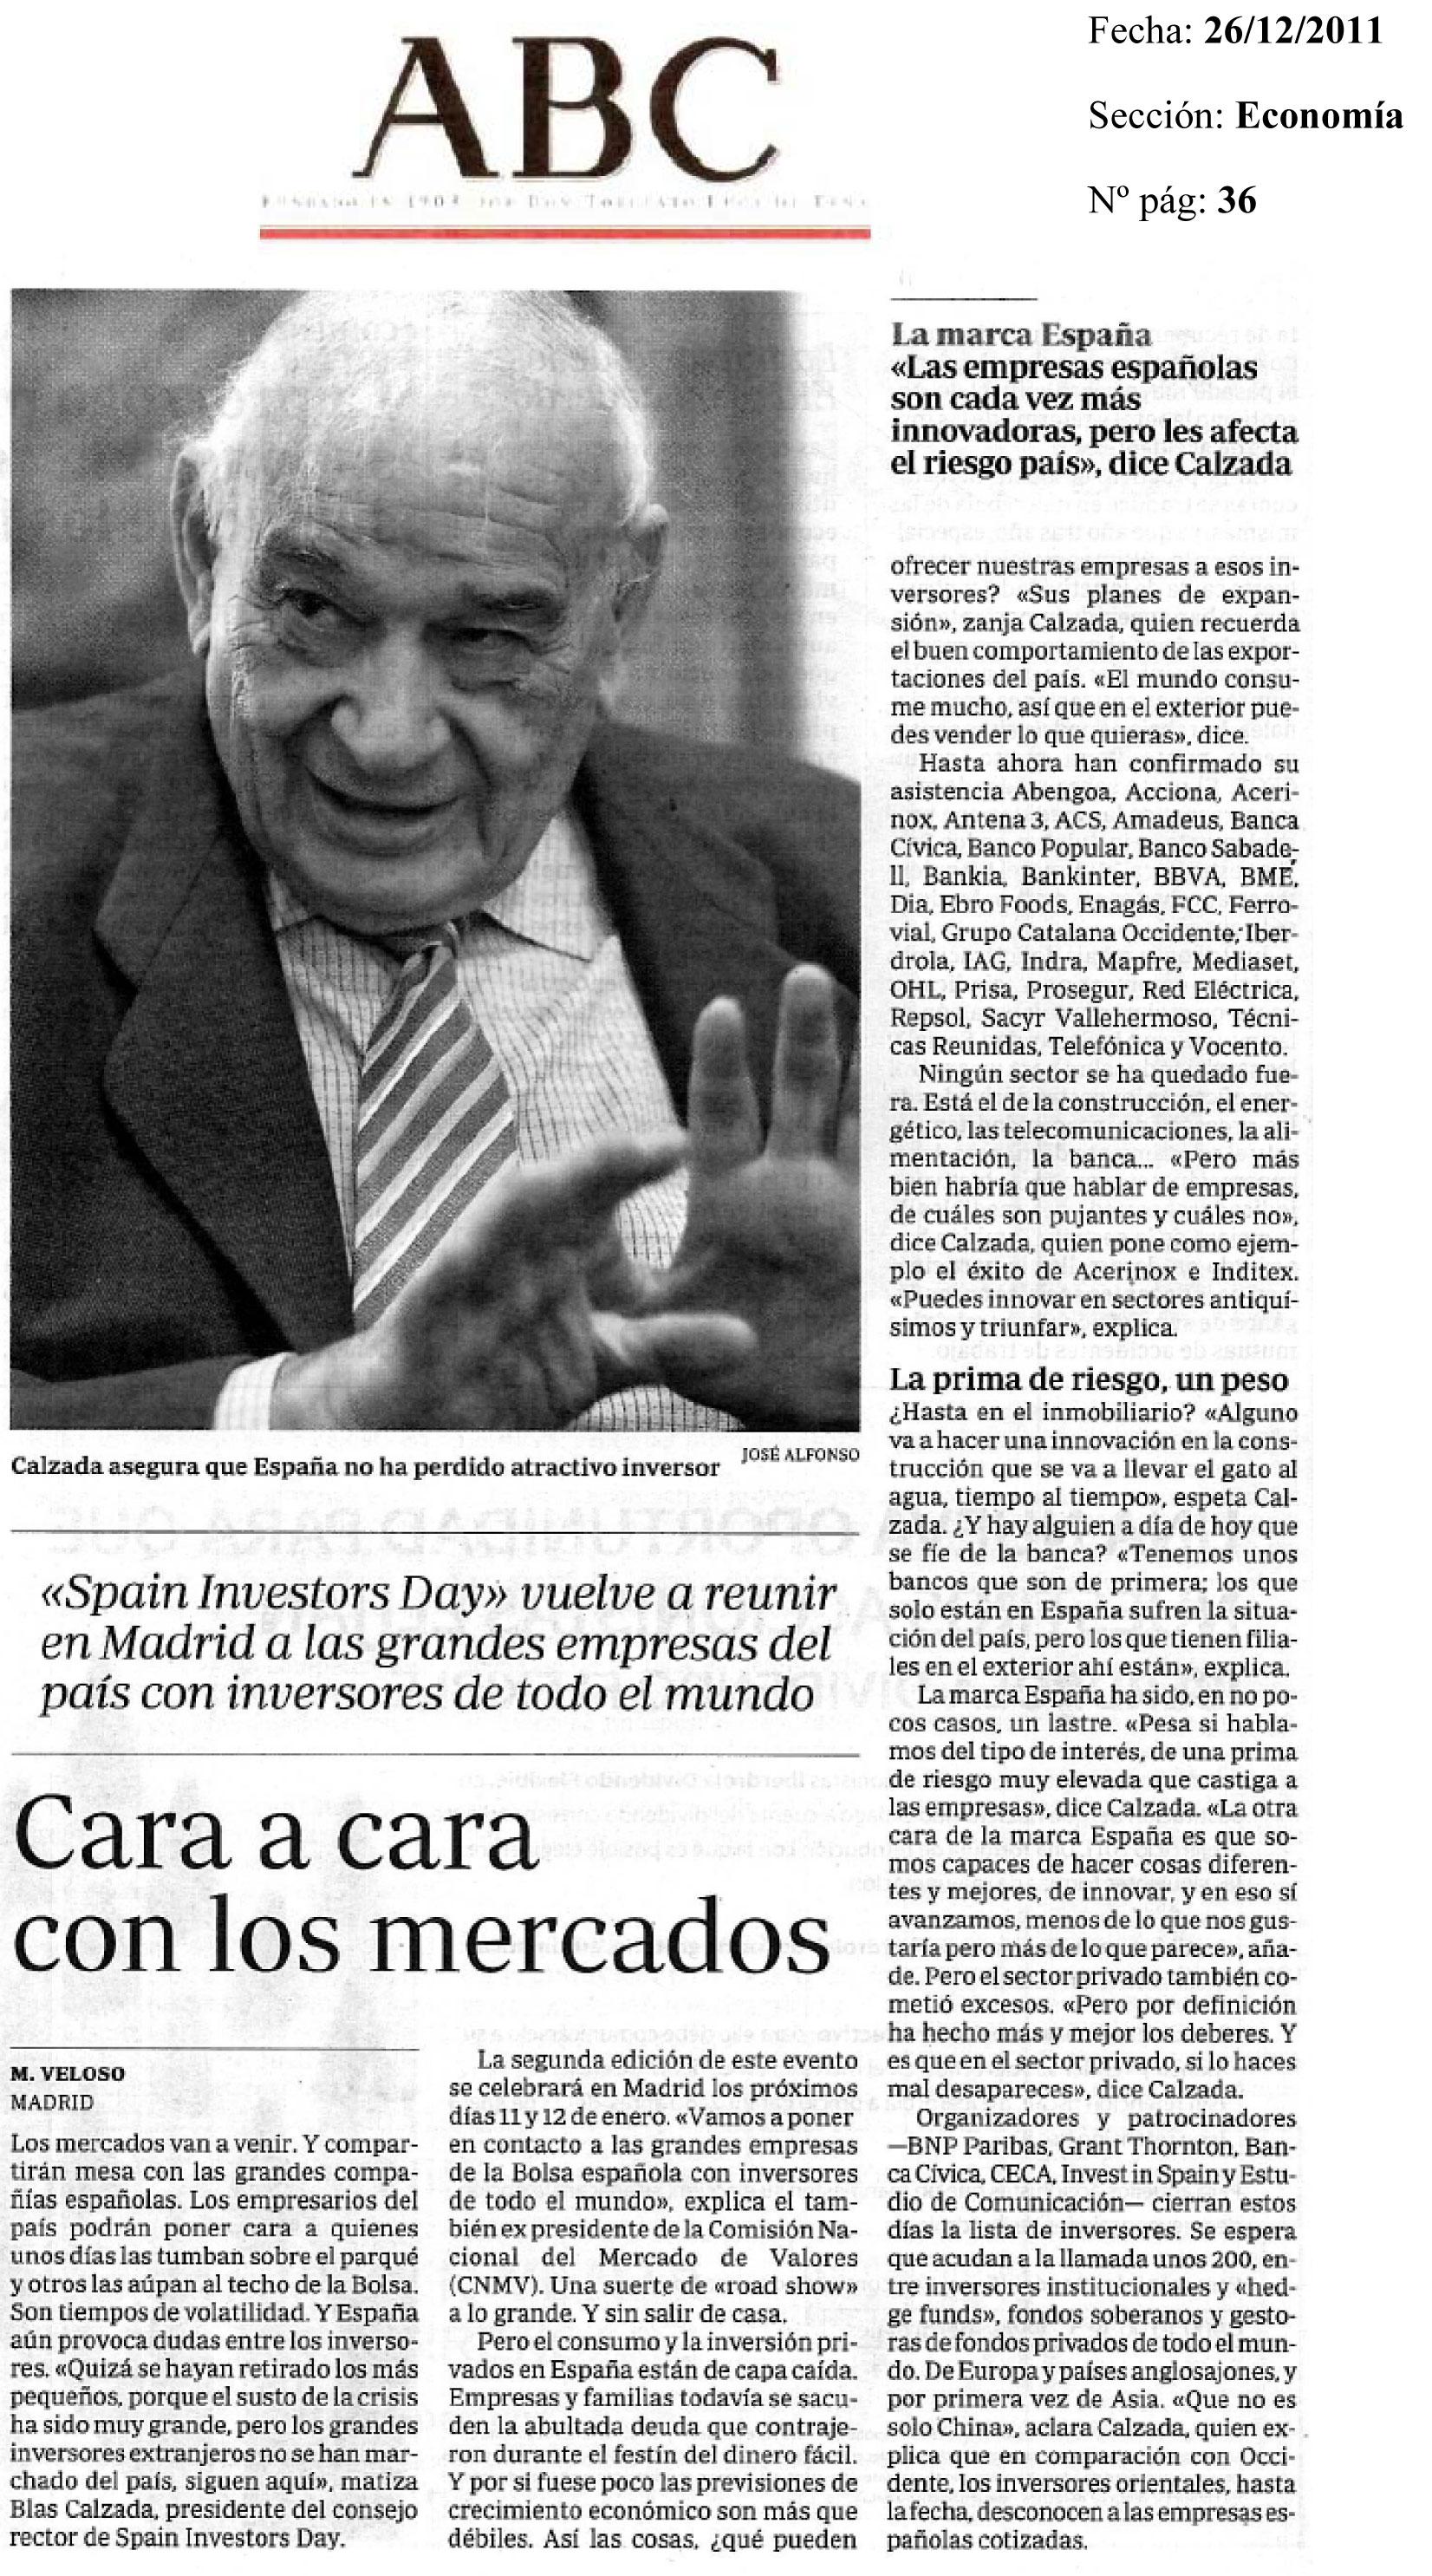 Noticias En Prensa ABC 26 12 2011